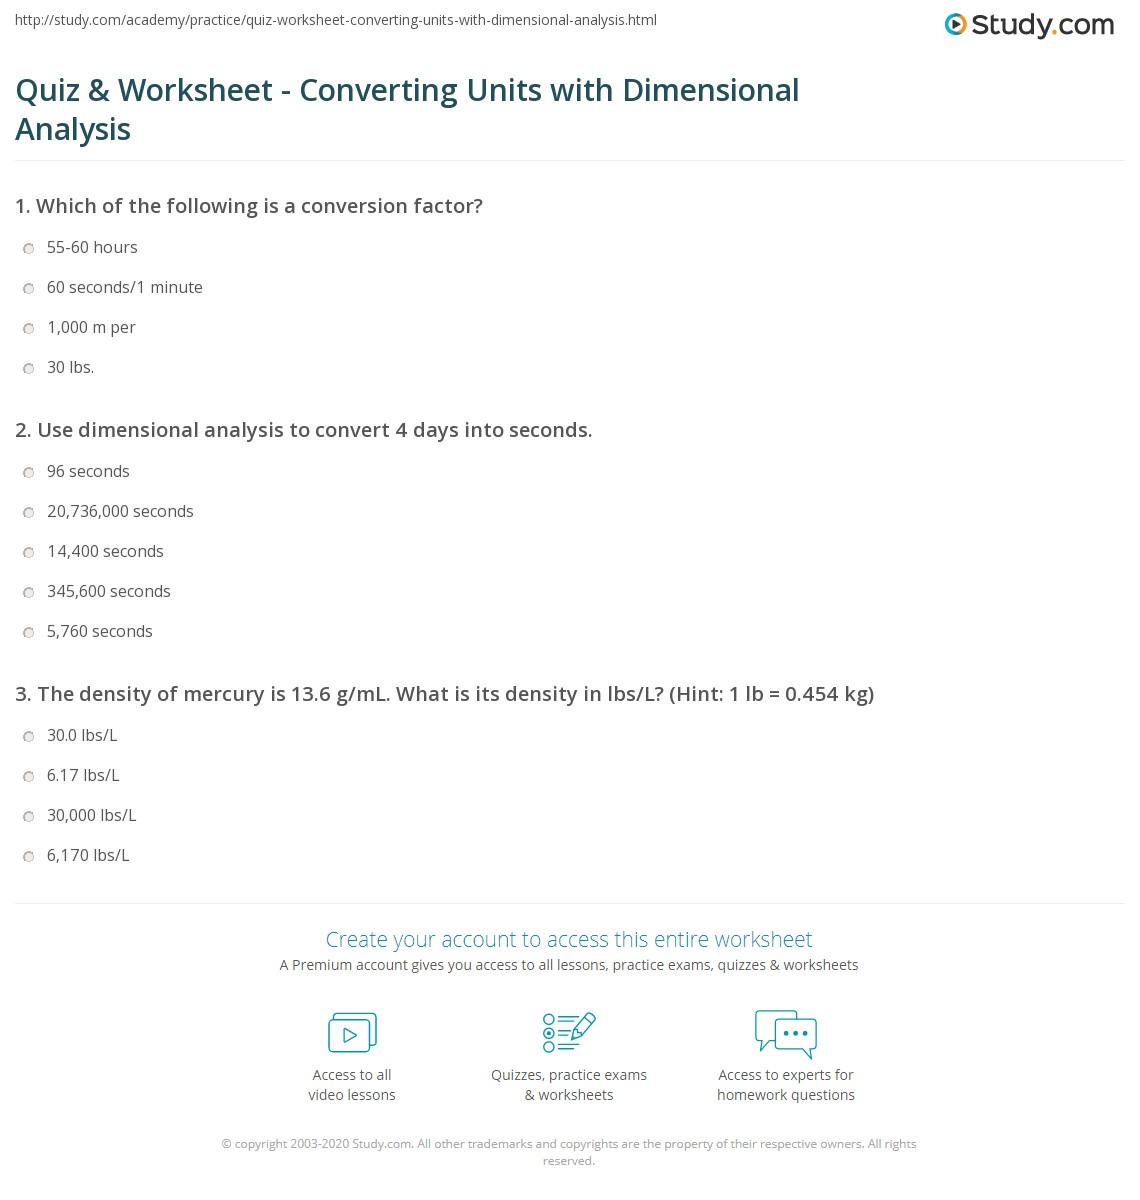 hight resolution of Dimensional Analysis Practice Worksheet Answer Key - Nidecmege